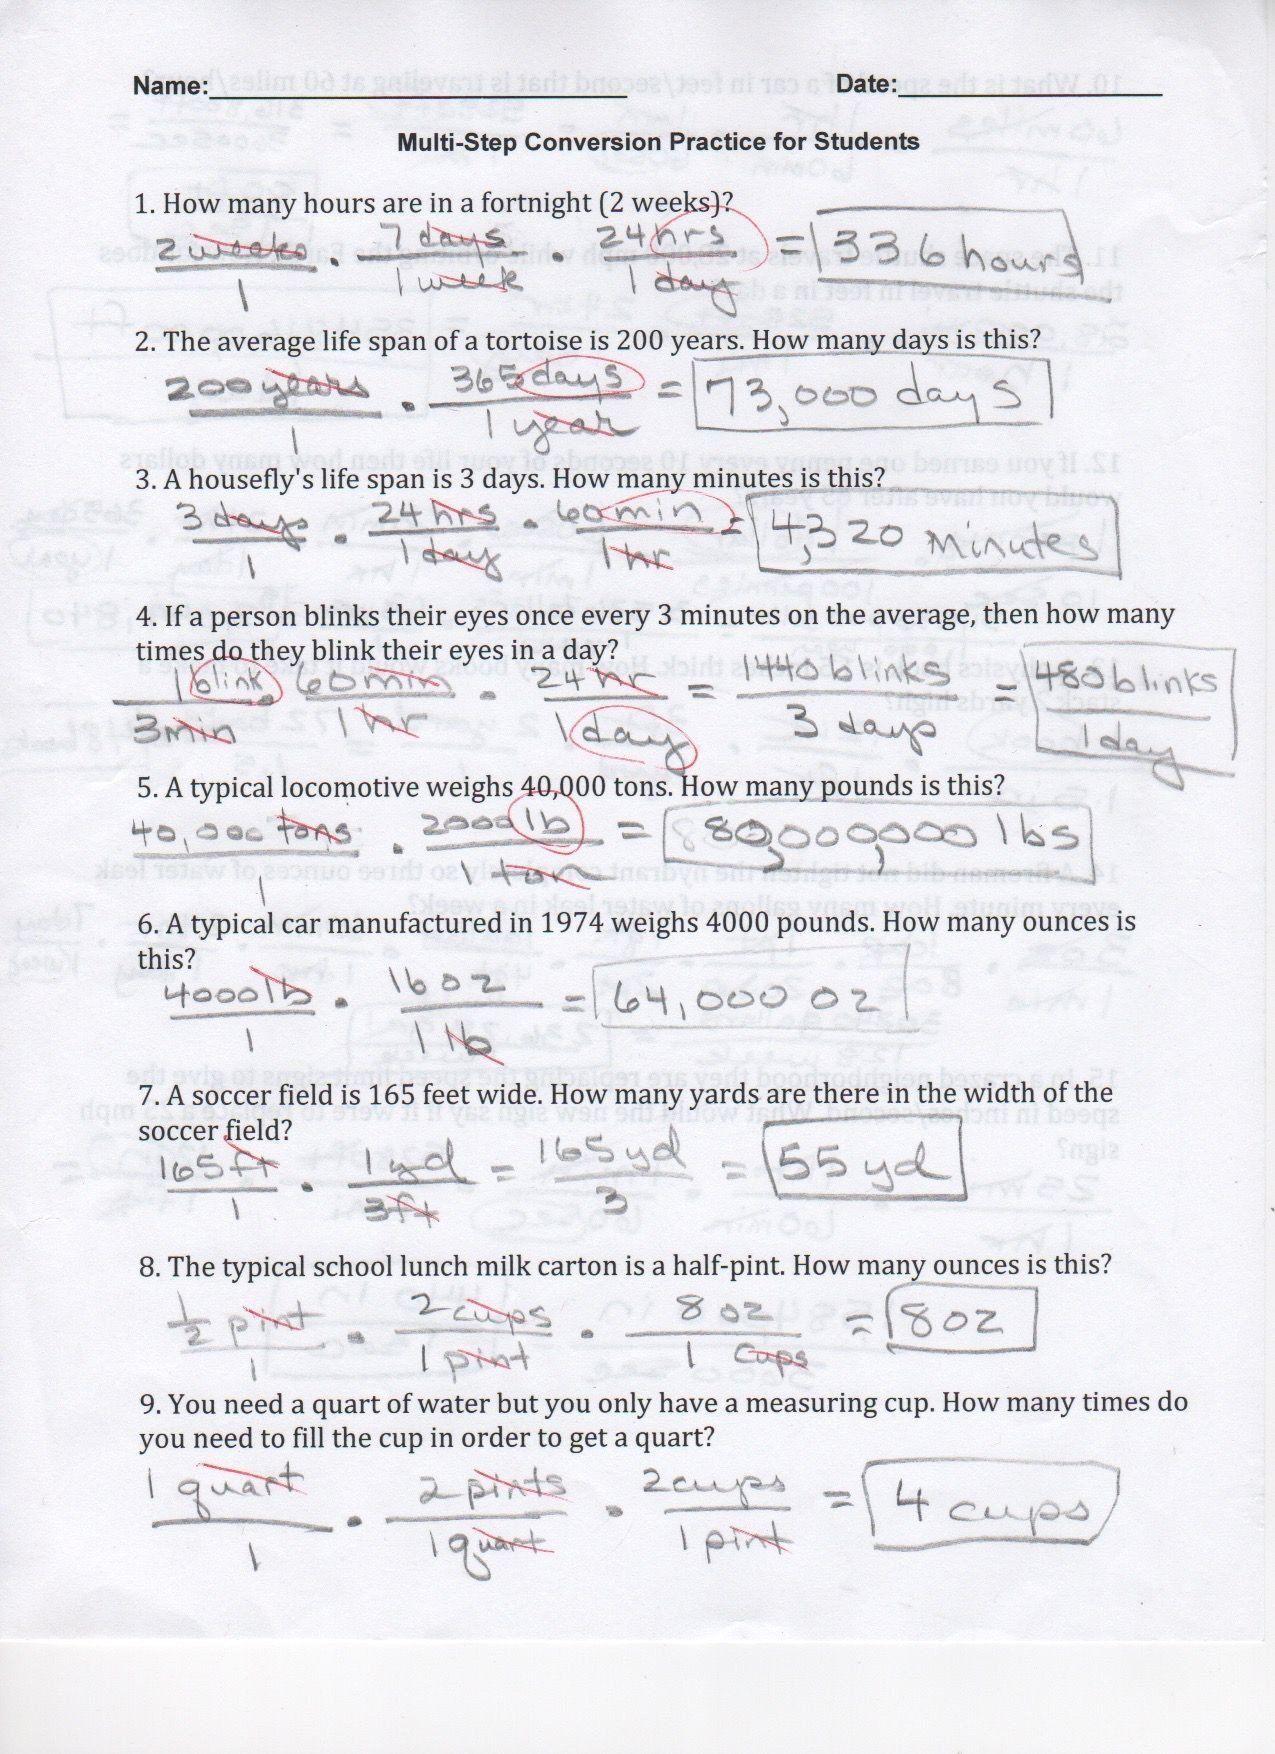 Dimensional Analysis Worksheet 2 Medication Calculations Using Dimensional Analysis With Print In 2020 Dimensional Analysis Word Problem Worksheets Literal Equations